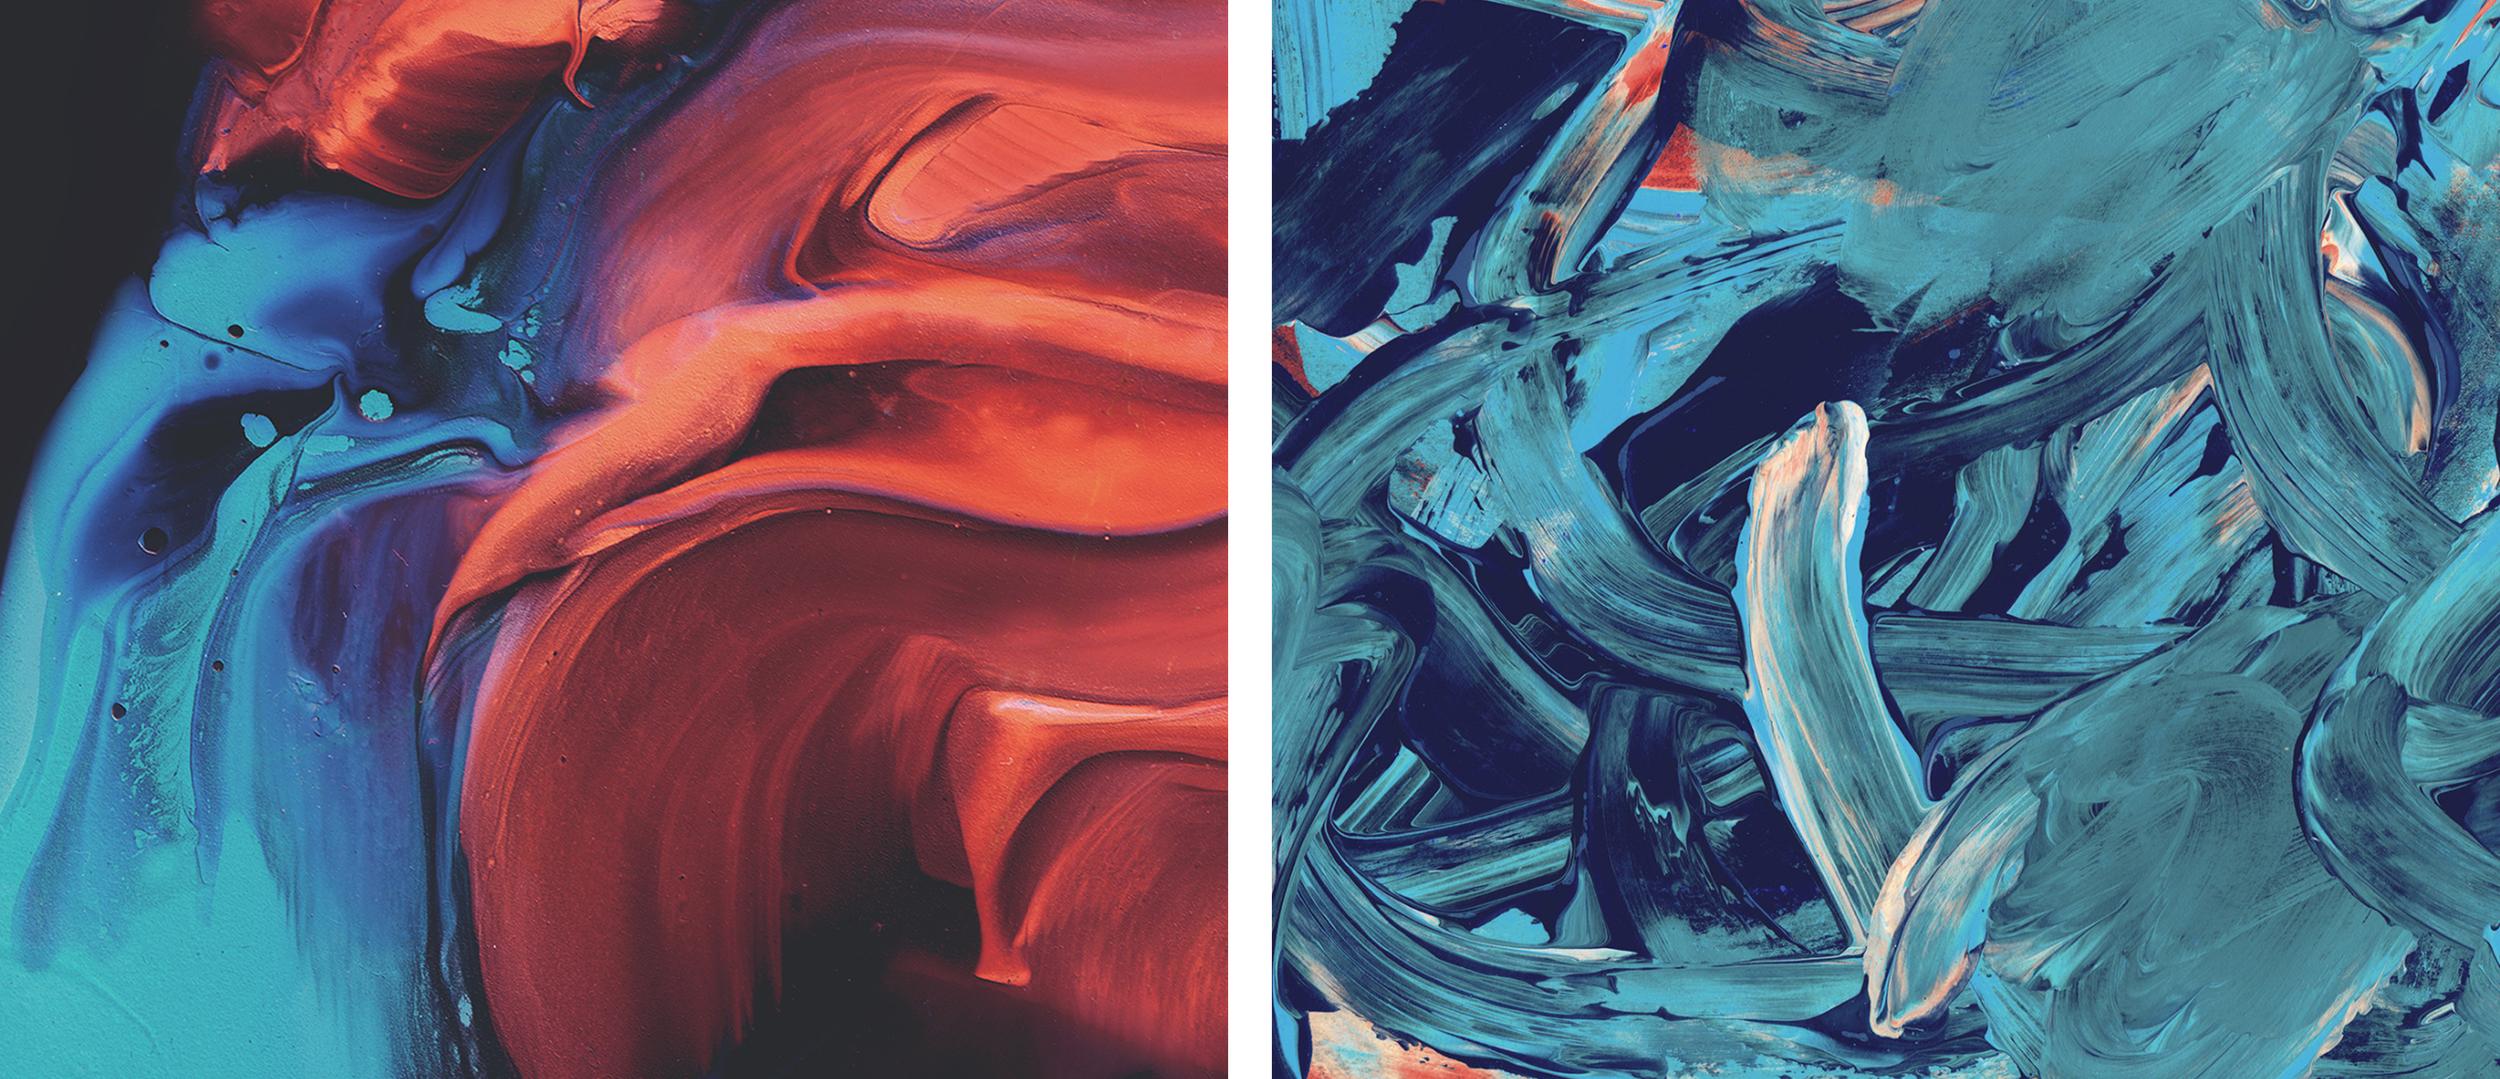 Untitled  //  Jack Vanzet //  Paint, Photography, 2015